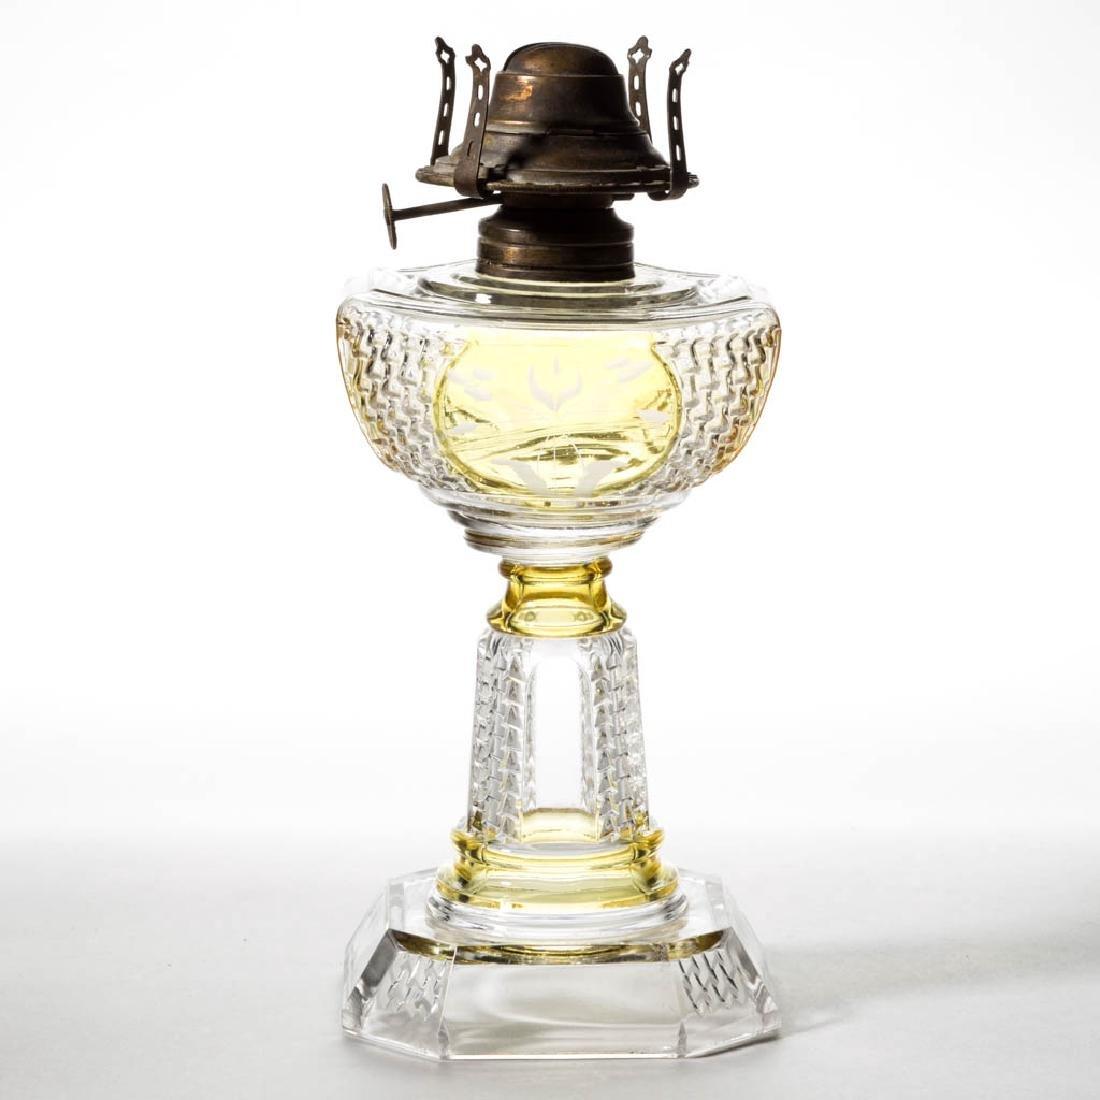 PICKET - AMBER-STAINED KEROSENE STAND LAMP